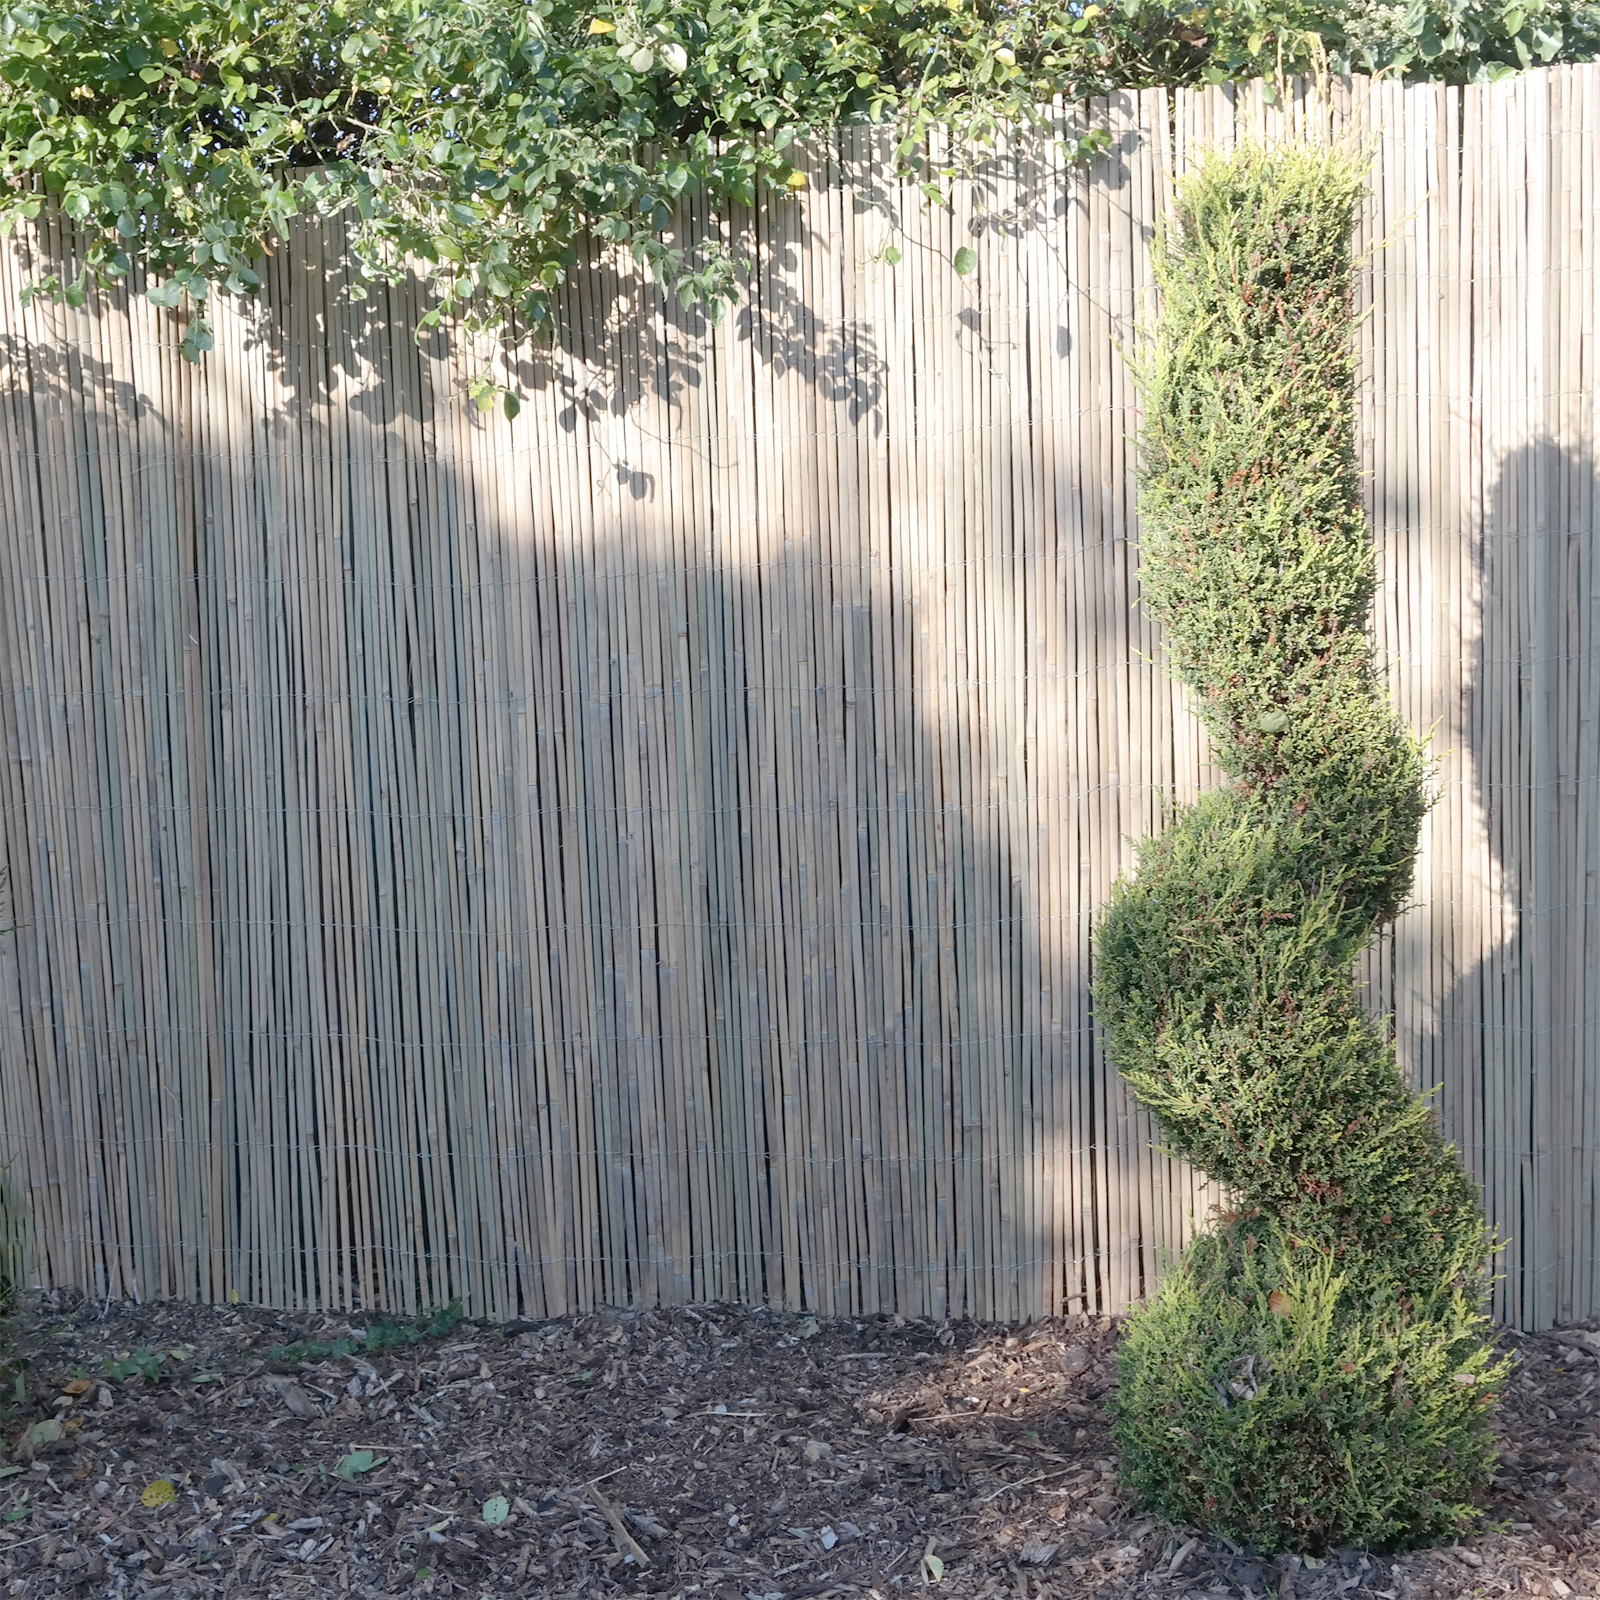 Picture of: Bamboo Slat Garden Divider Screening Border Outdoor Fencing Panels 4m Long Rolls Ebay